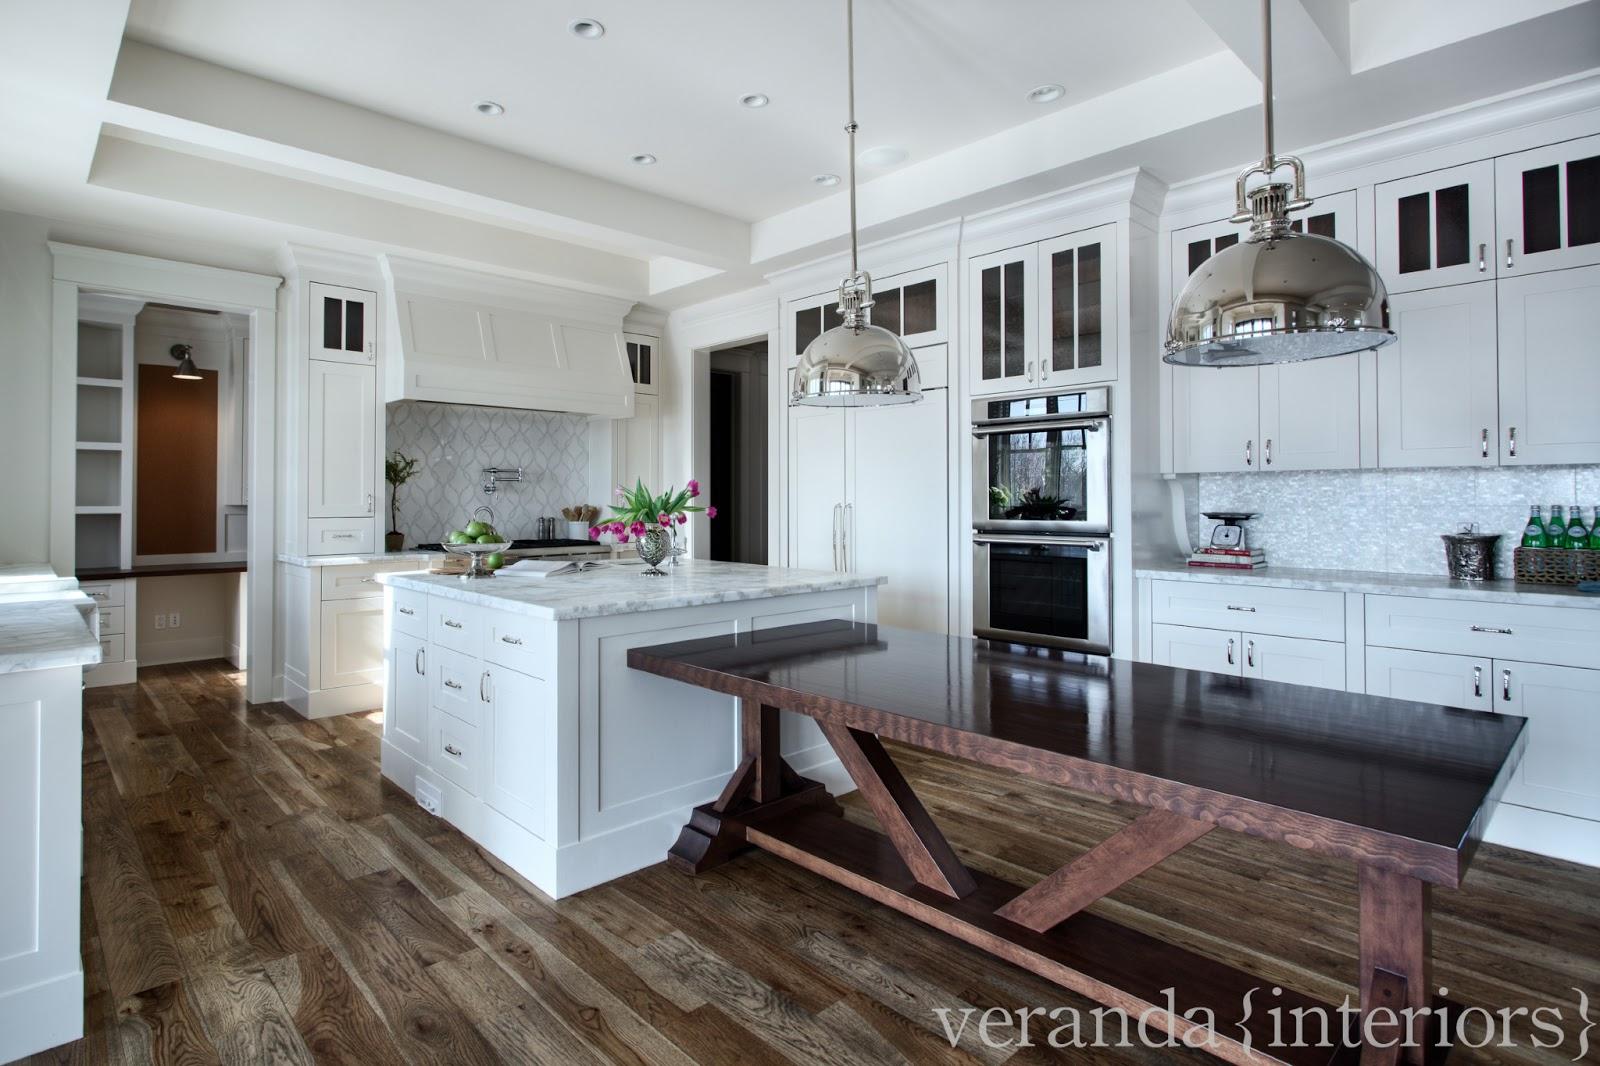 watermark 1 kitchen. Black Bedroom Furniture Sets. Home Design Ideas